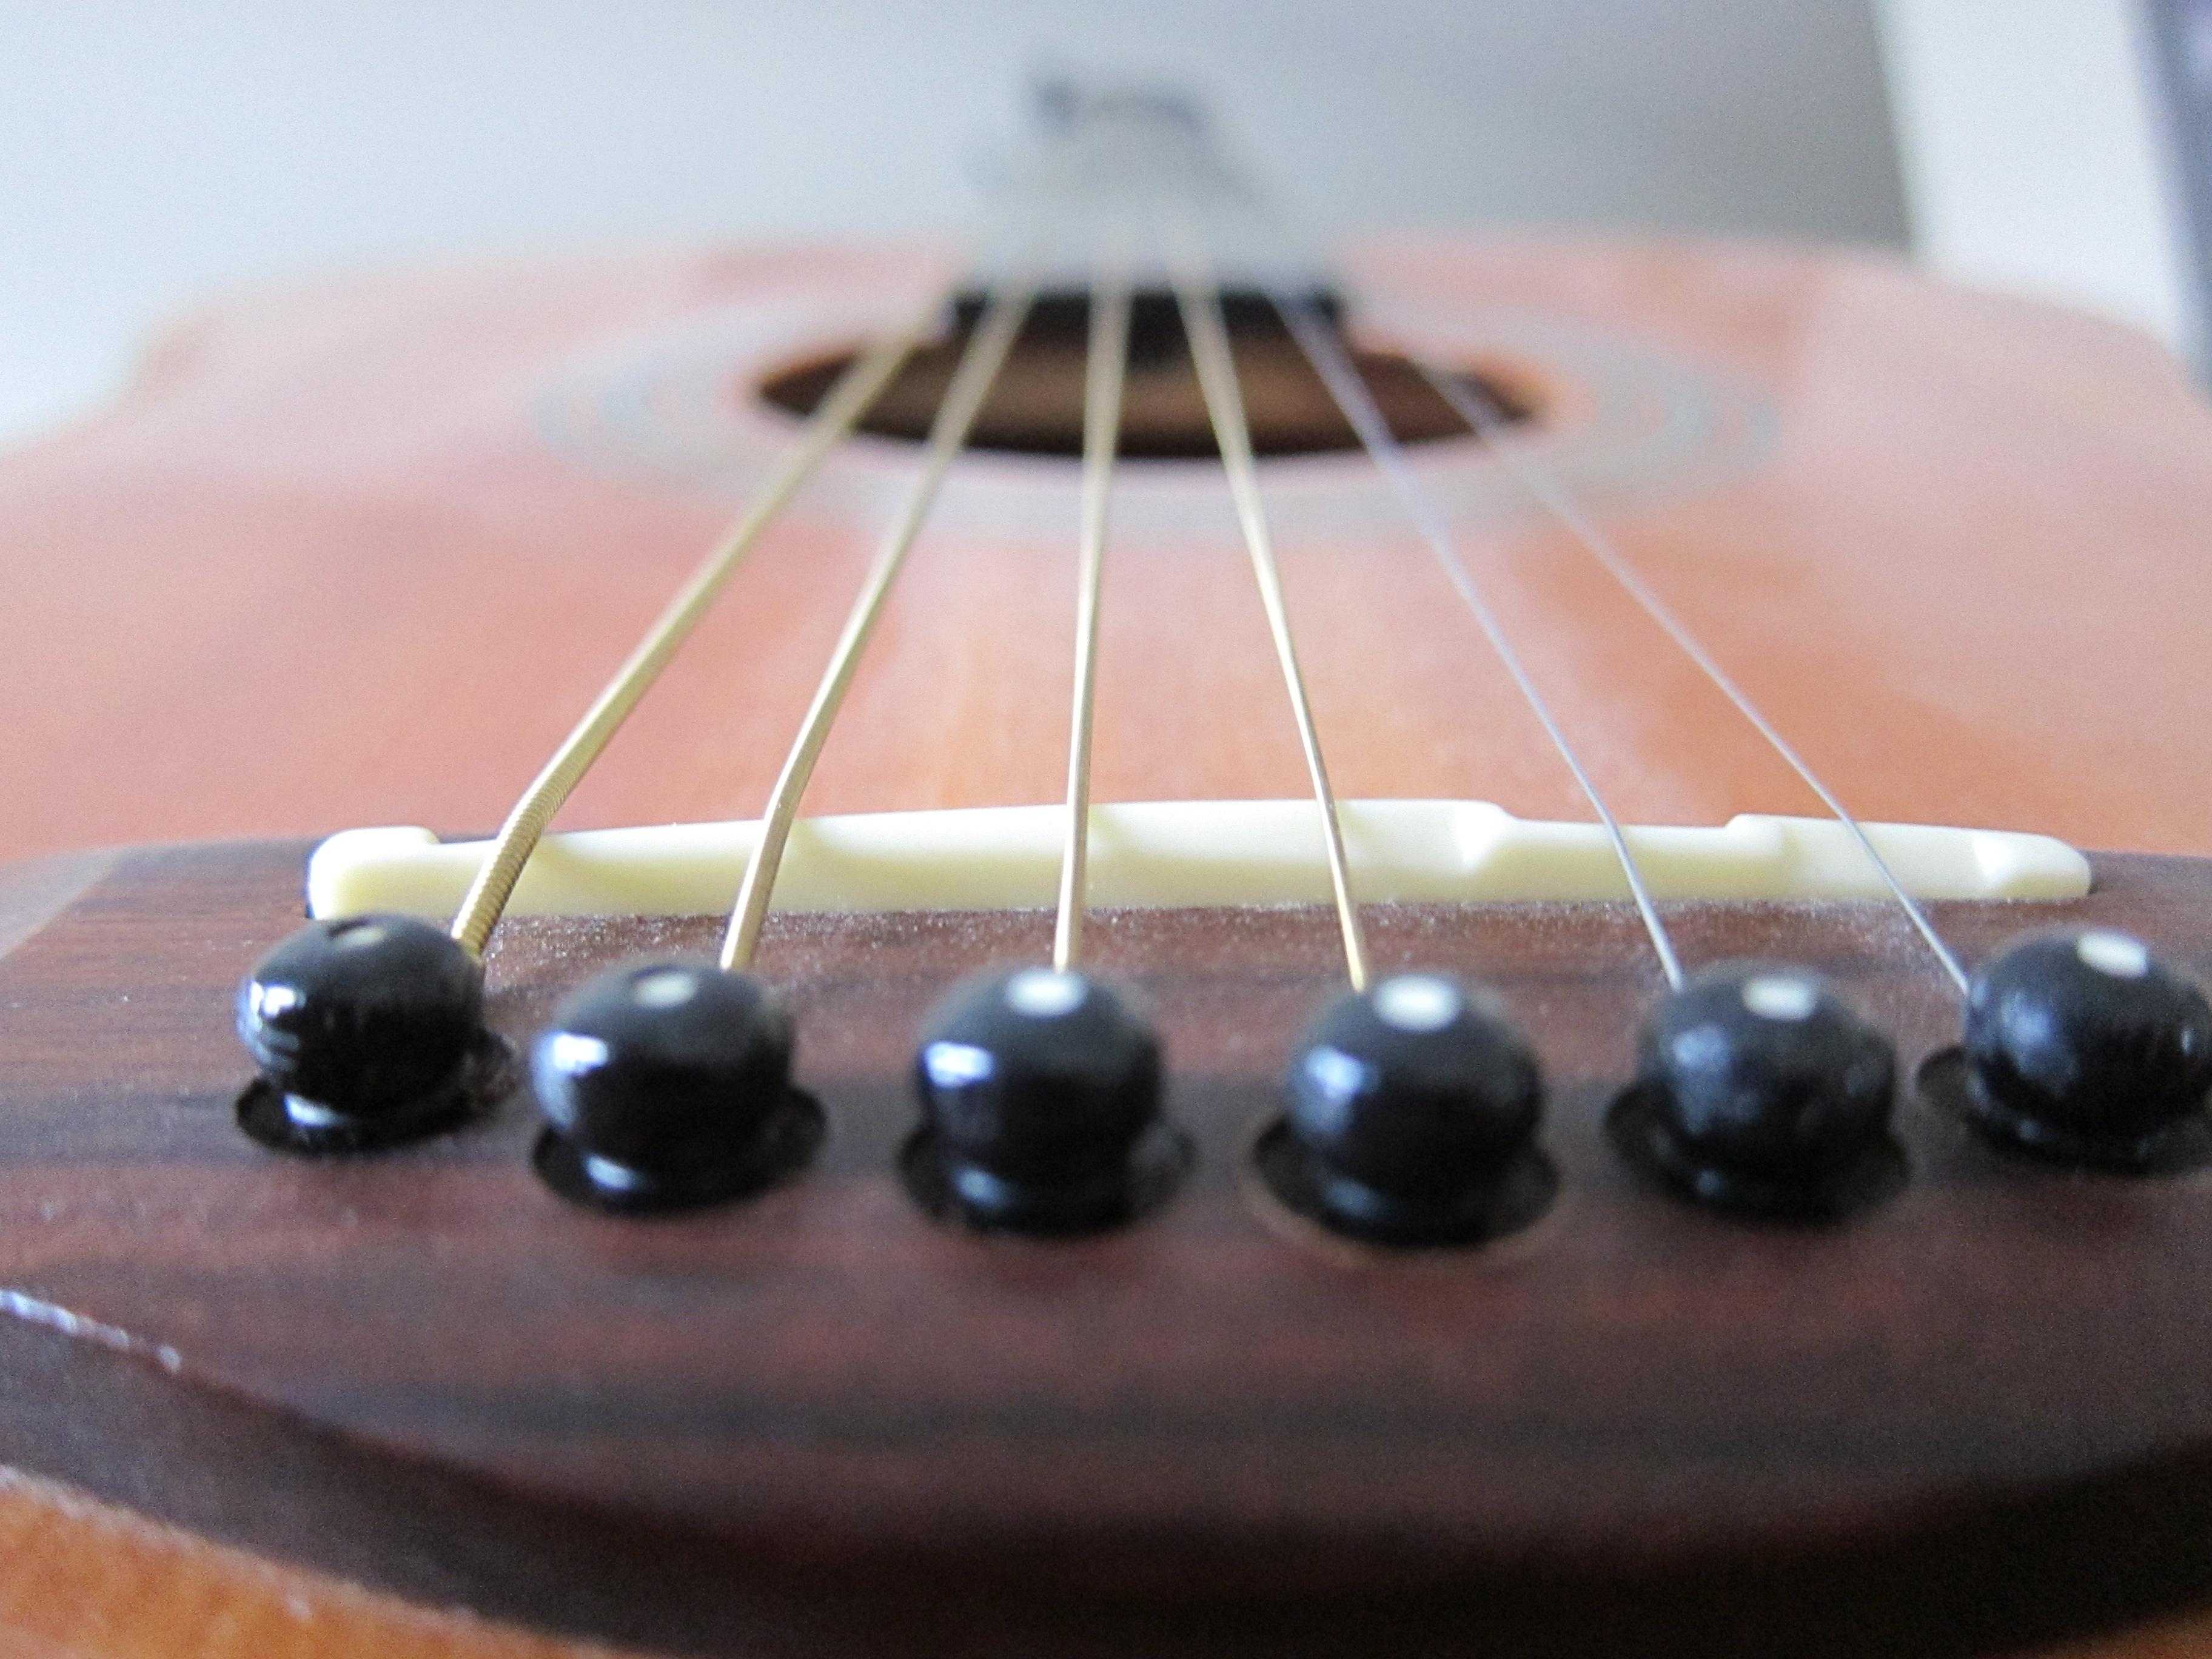 Guitar from the bridge photo